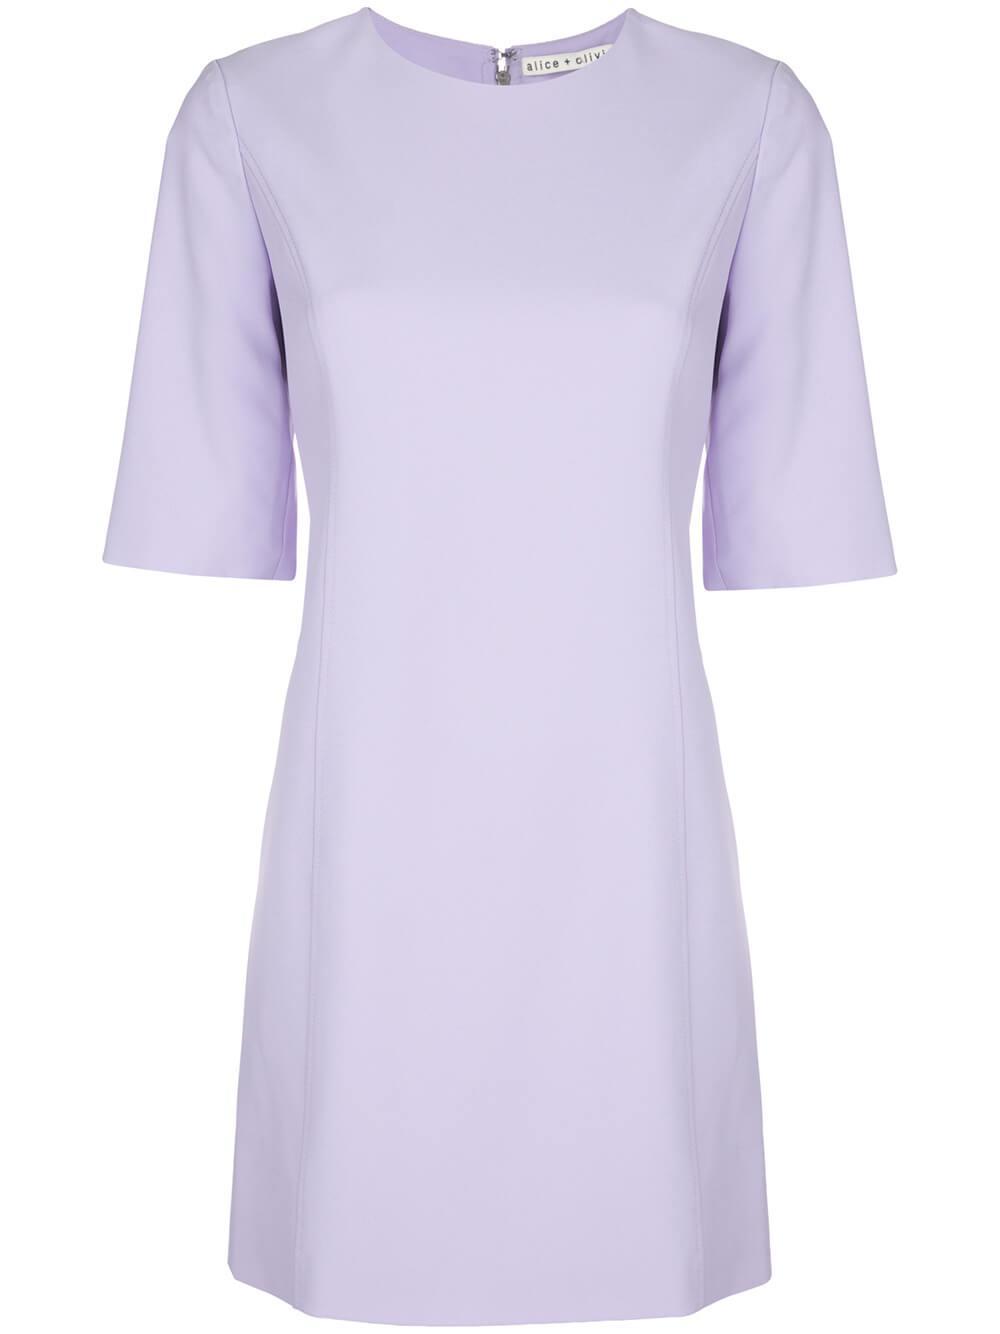 Coley Short Sleeves Aline Shift Dress Item # CC911202508